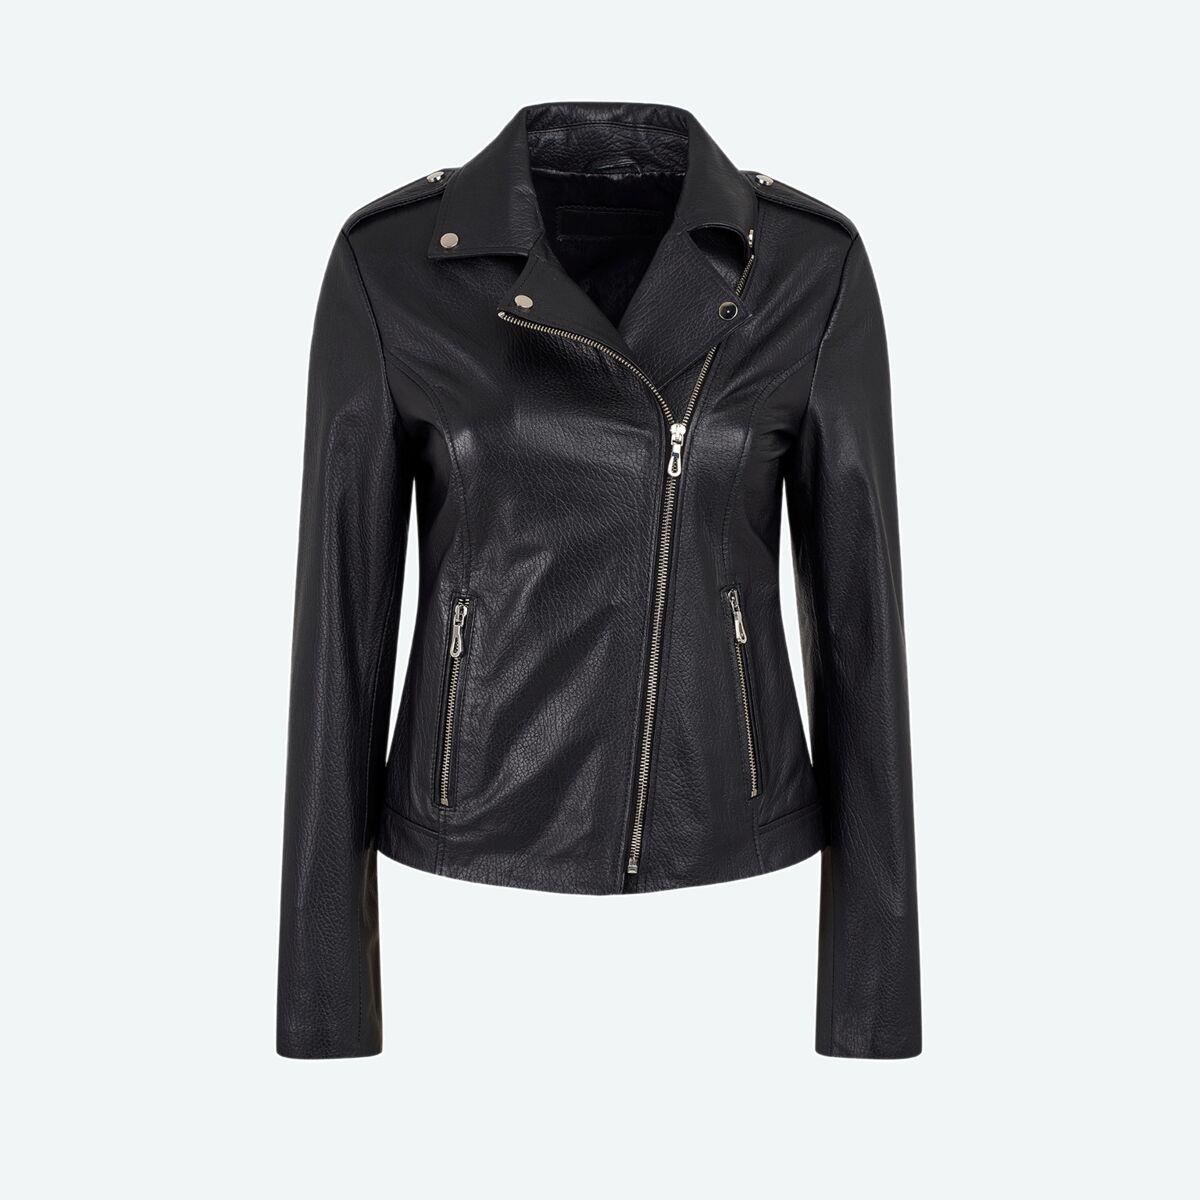 Women's Classic Biker Jacket - Black